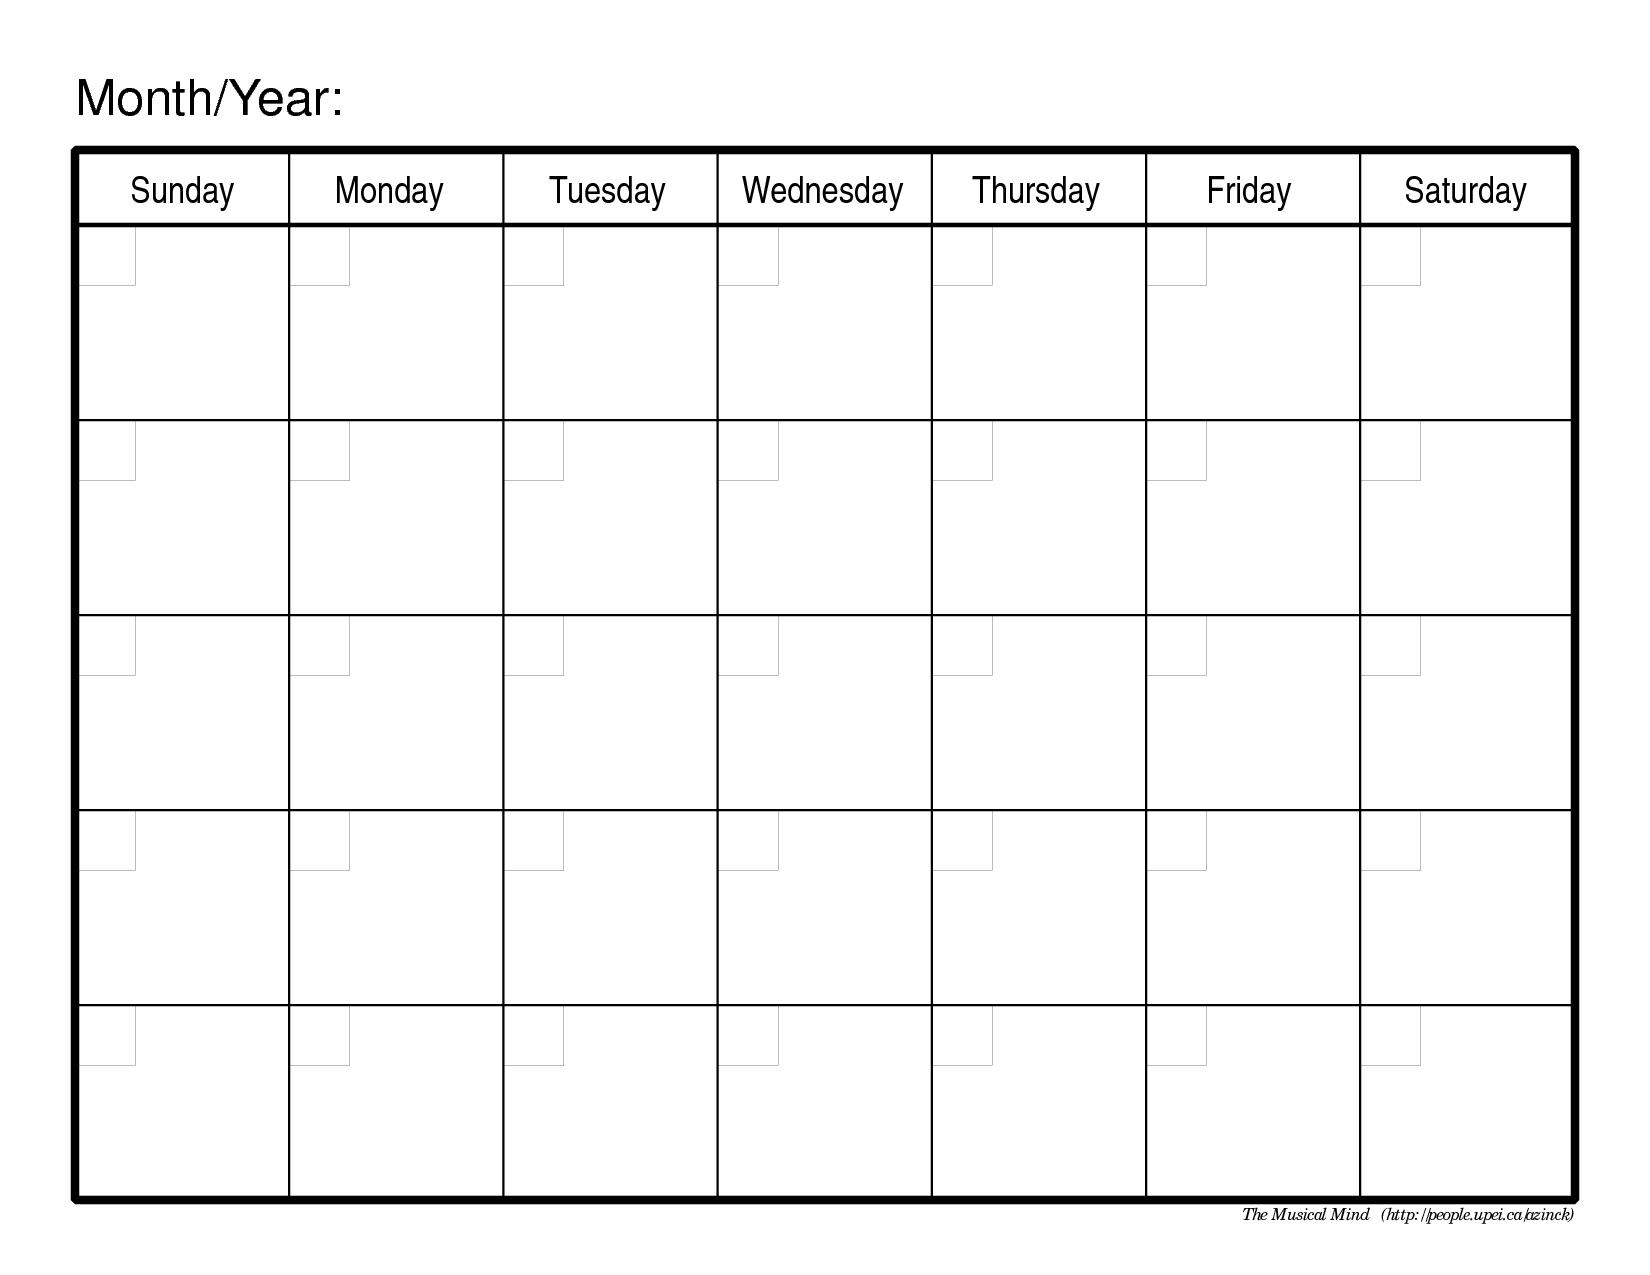 Monthly Calendar Template Aplg Planetariums  Xjb